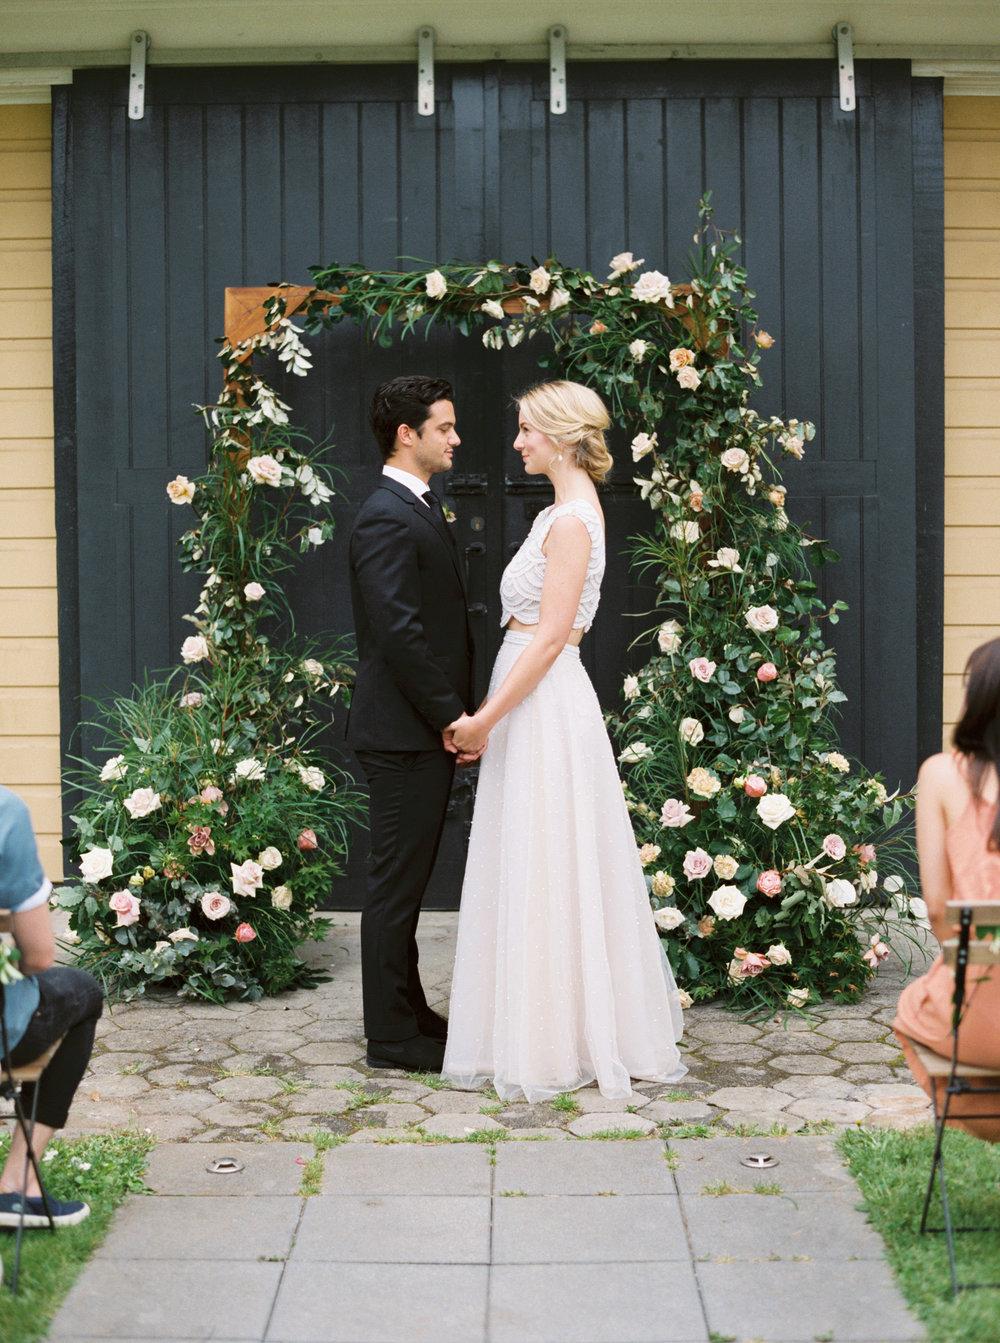 Timeless Southern Highland Wedding Elopement in Bowral NSW Fine Art Film Photographer Sheri McMahon-19.jpg